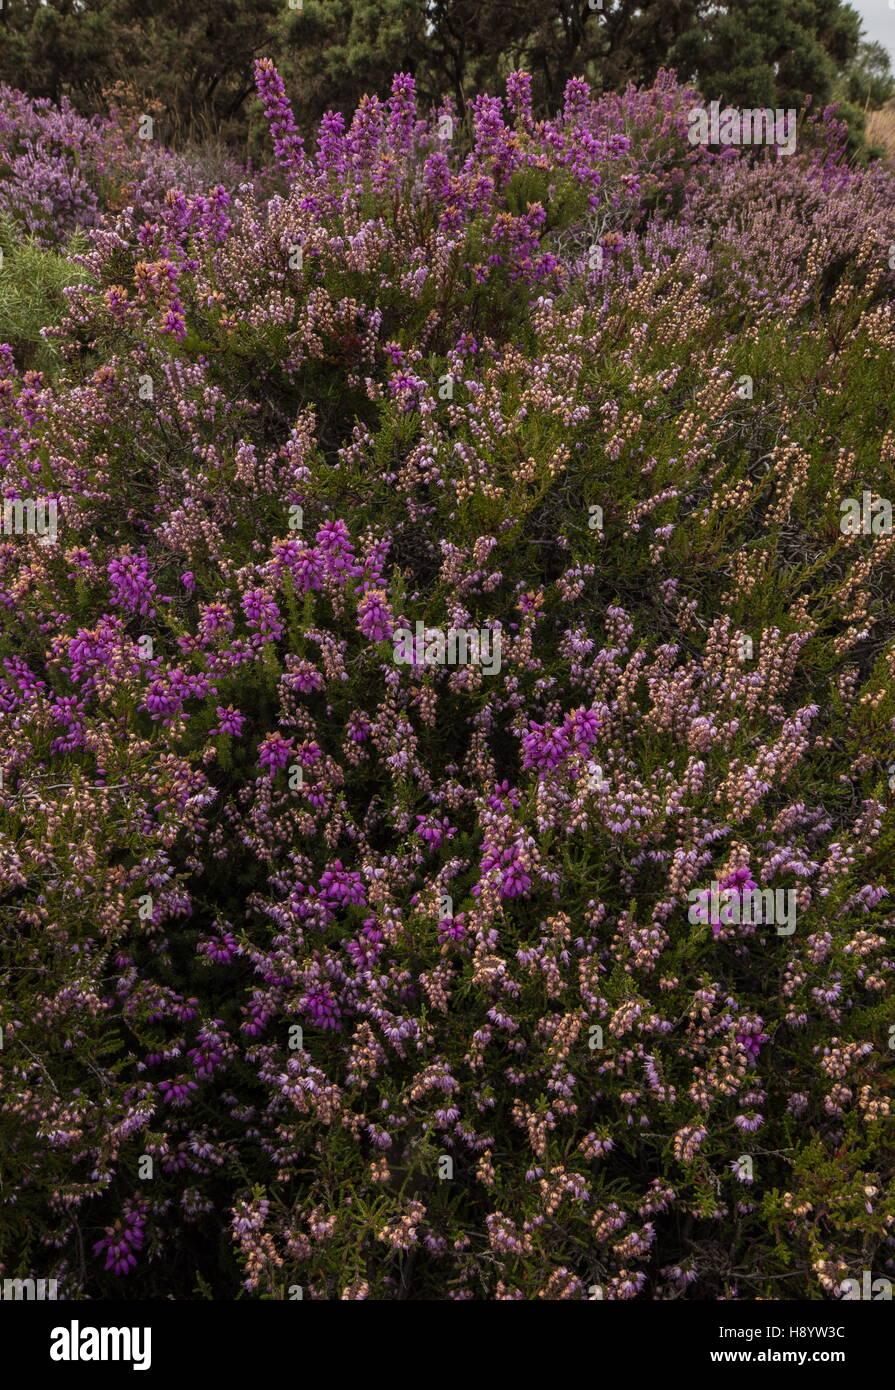 Dorset Heathland - Bell Heather, Erica cinerea, and Heather Calluna vulgaris, Hartland Moor, Dorset. Stock Photo